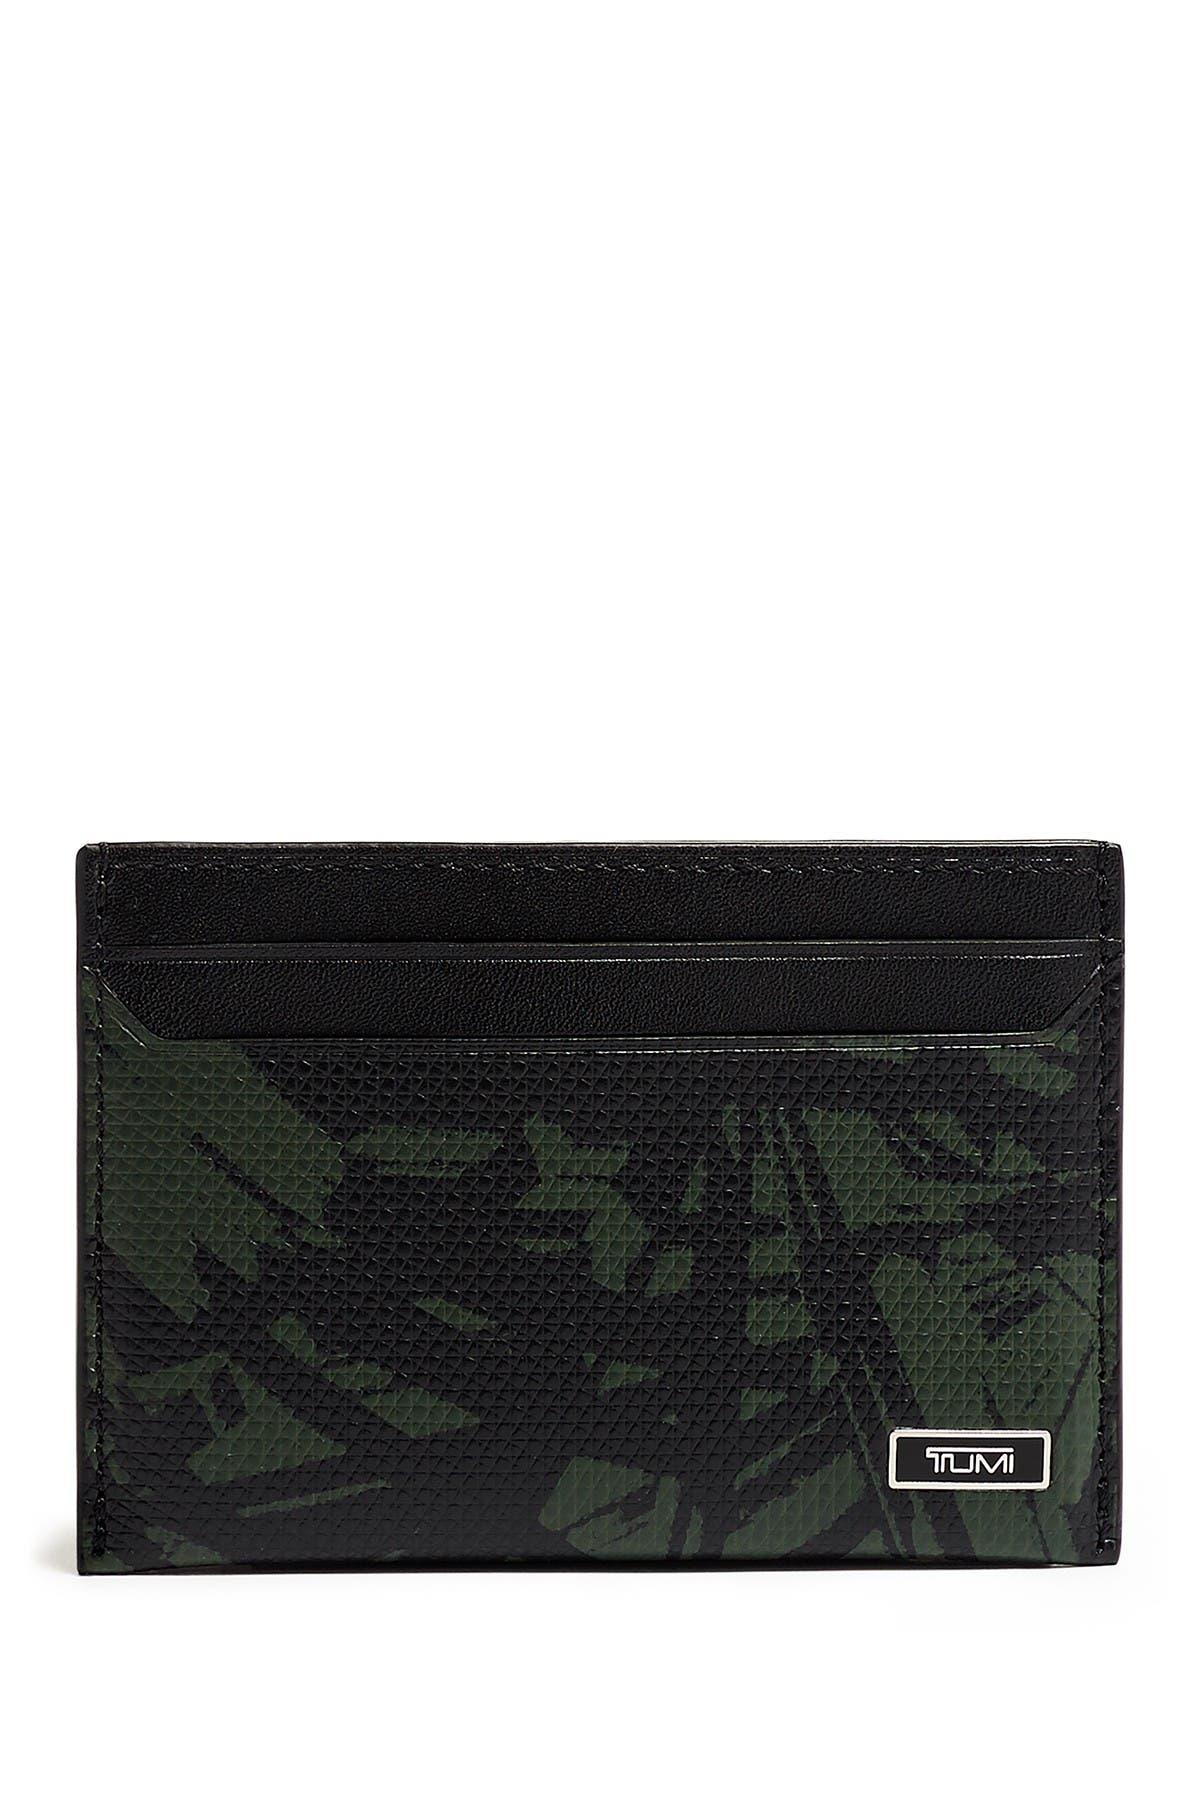 Image of Tumi Palm Slim Card Case